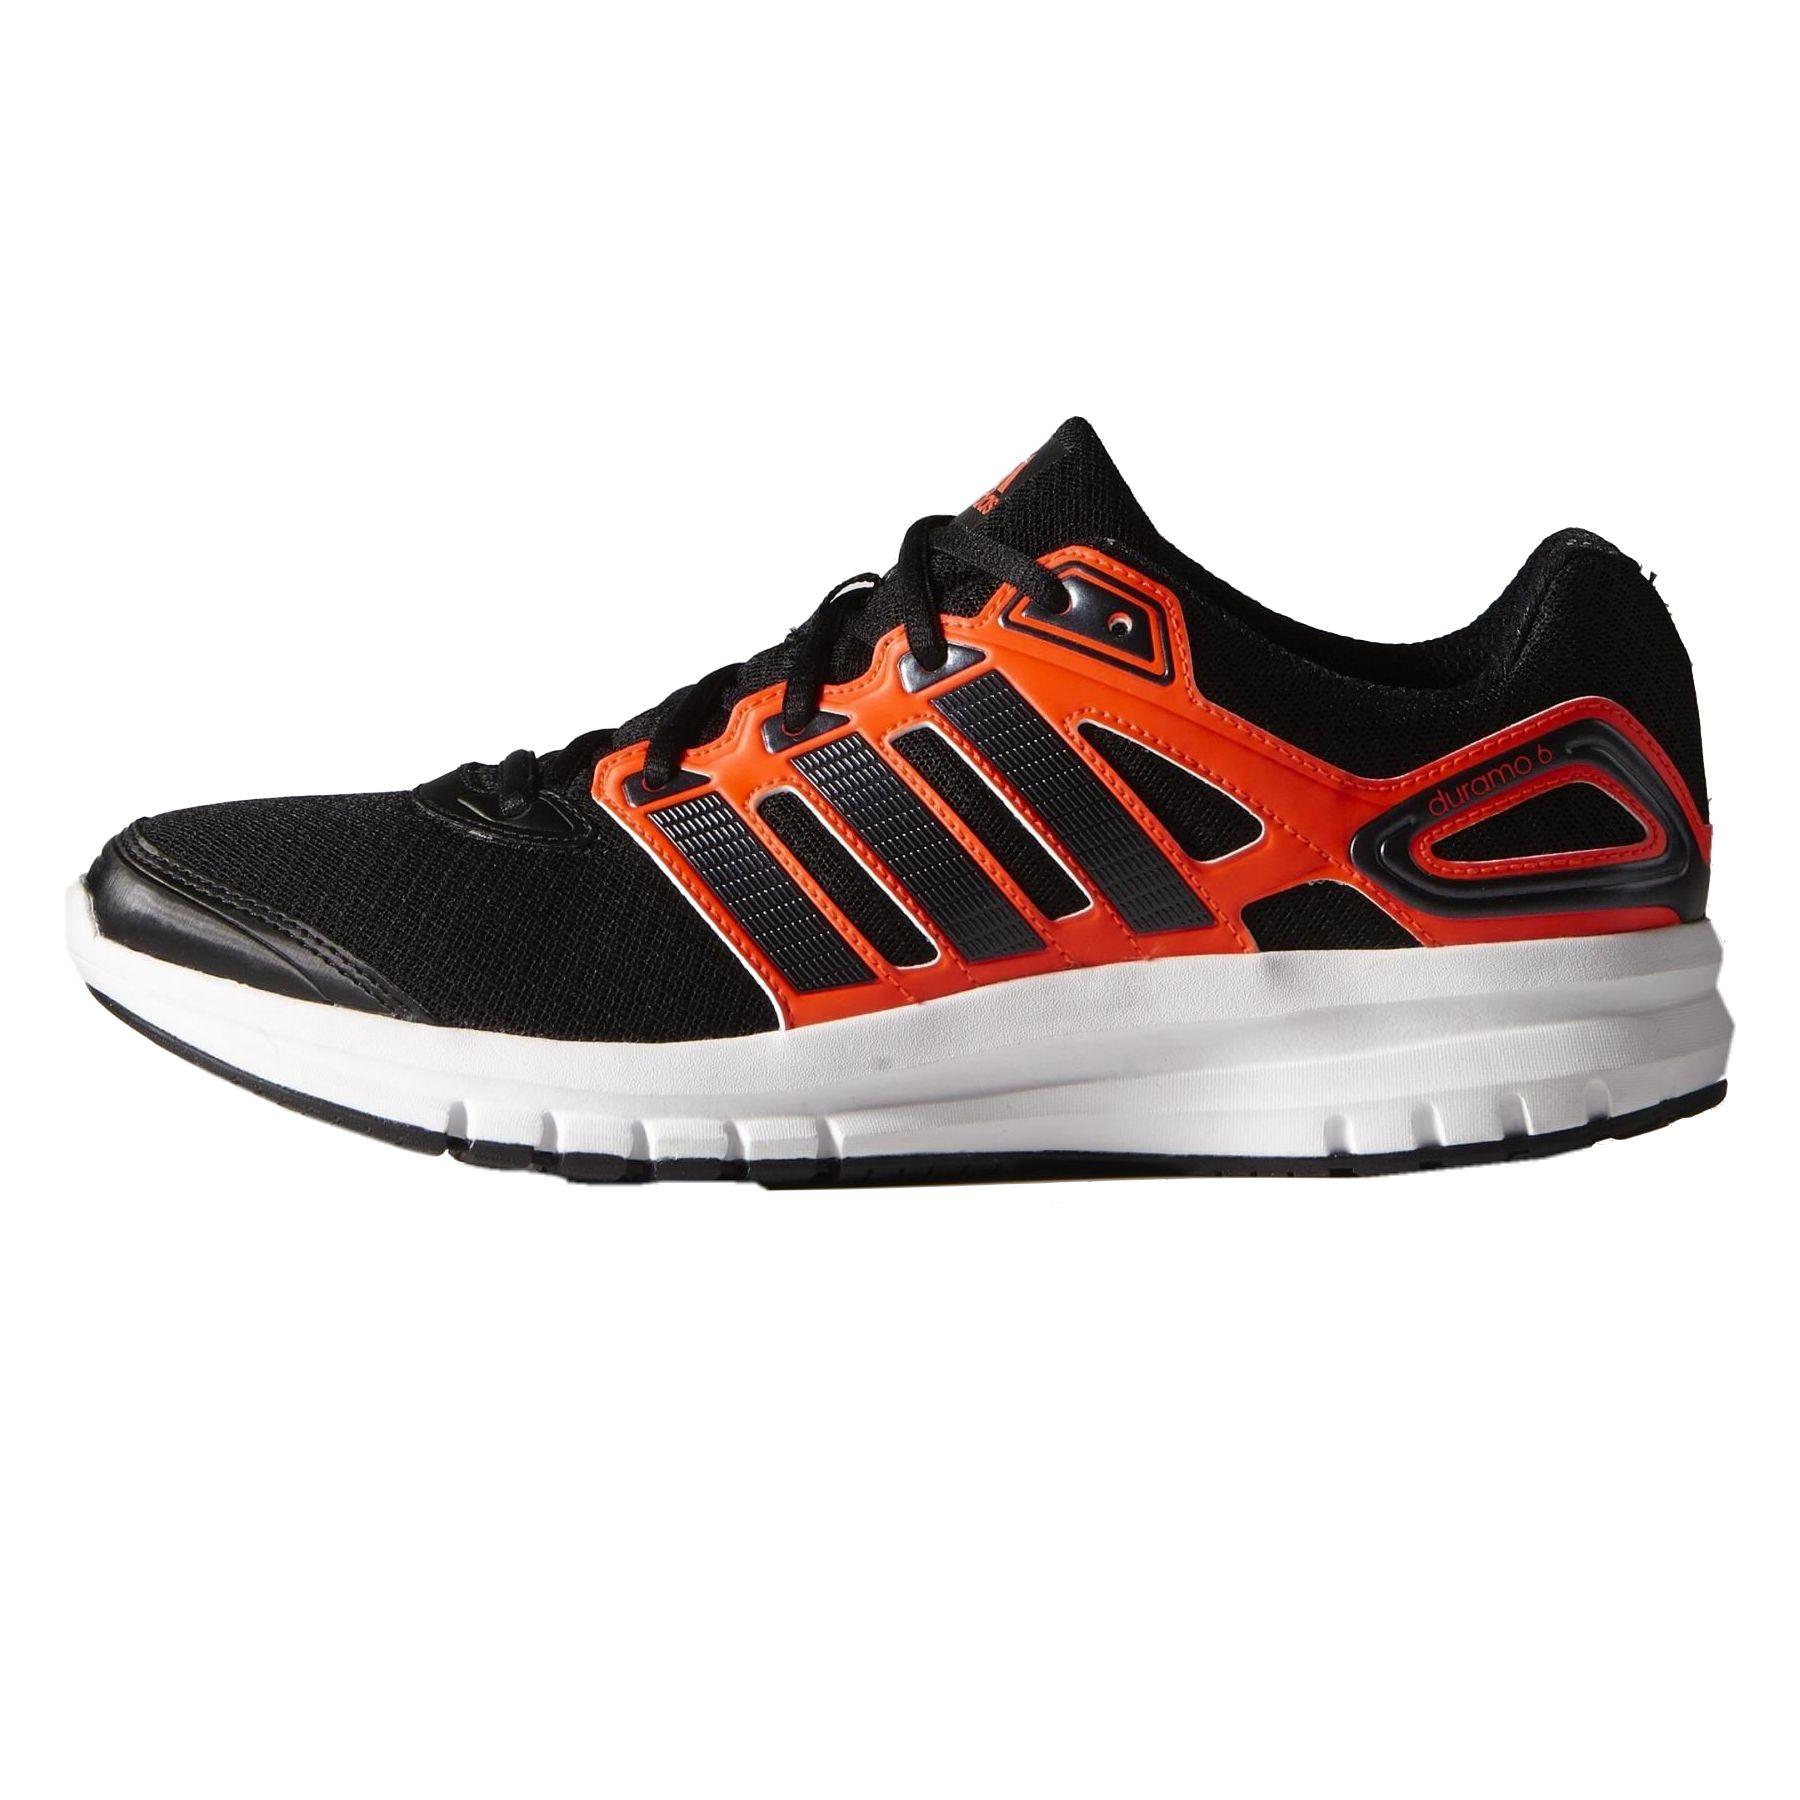 adidas duramo 6 schuhe laufschuhe joggingschuhe sportschuhe herren ebay. Black Bedroom Furniture Sets. Home Design Ideas